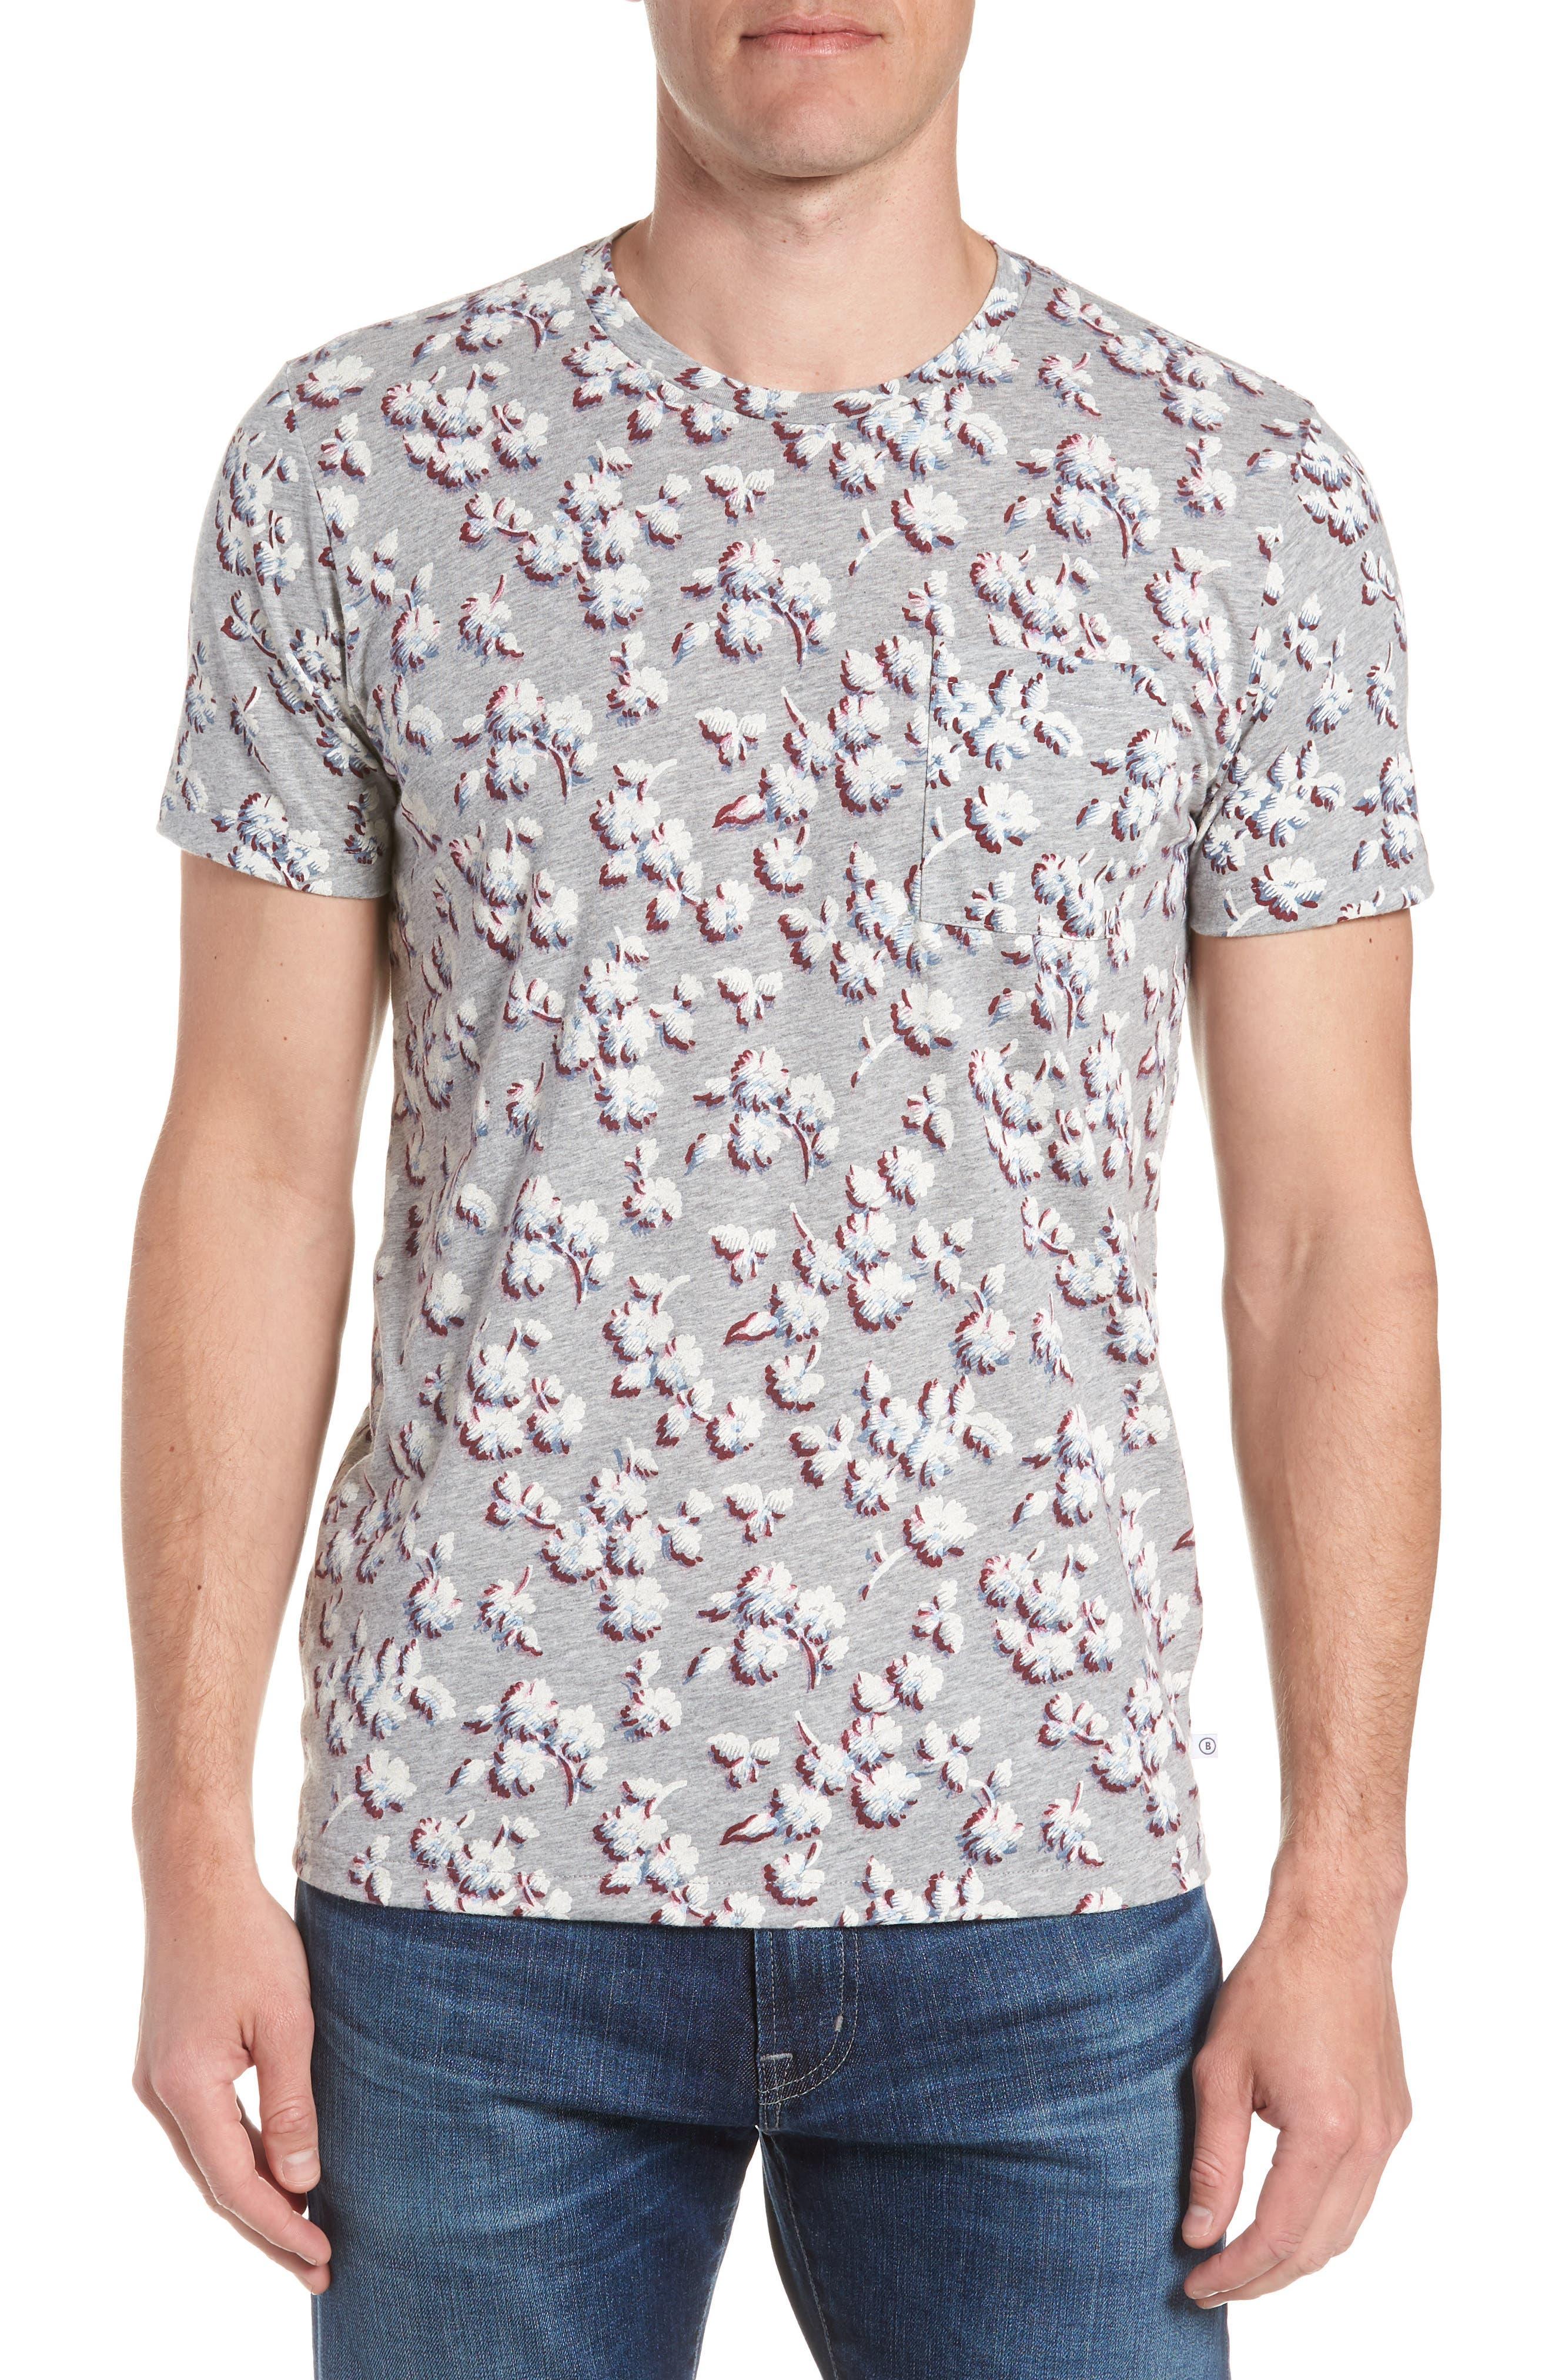 Slim Fit Floral Pocket T-Shirt,                             Main thumbnail 1, color,                             Grey/ La Rioja/ Blue